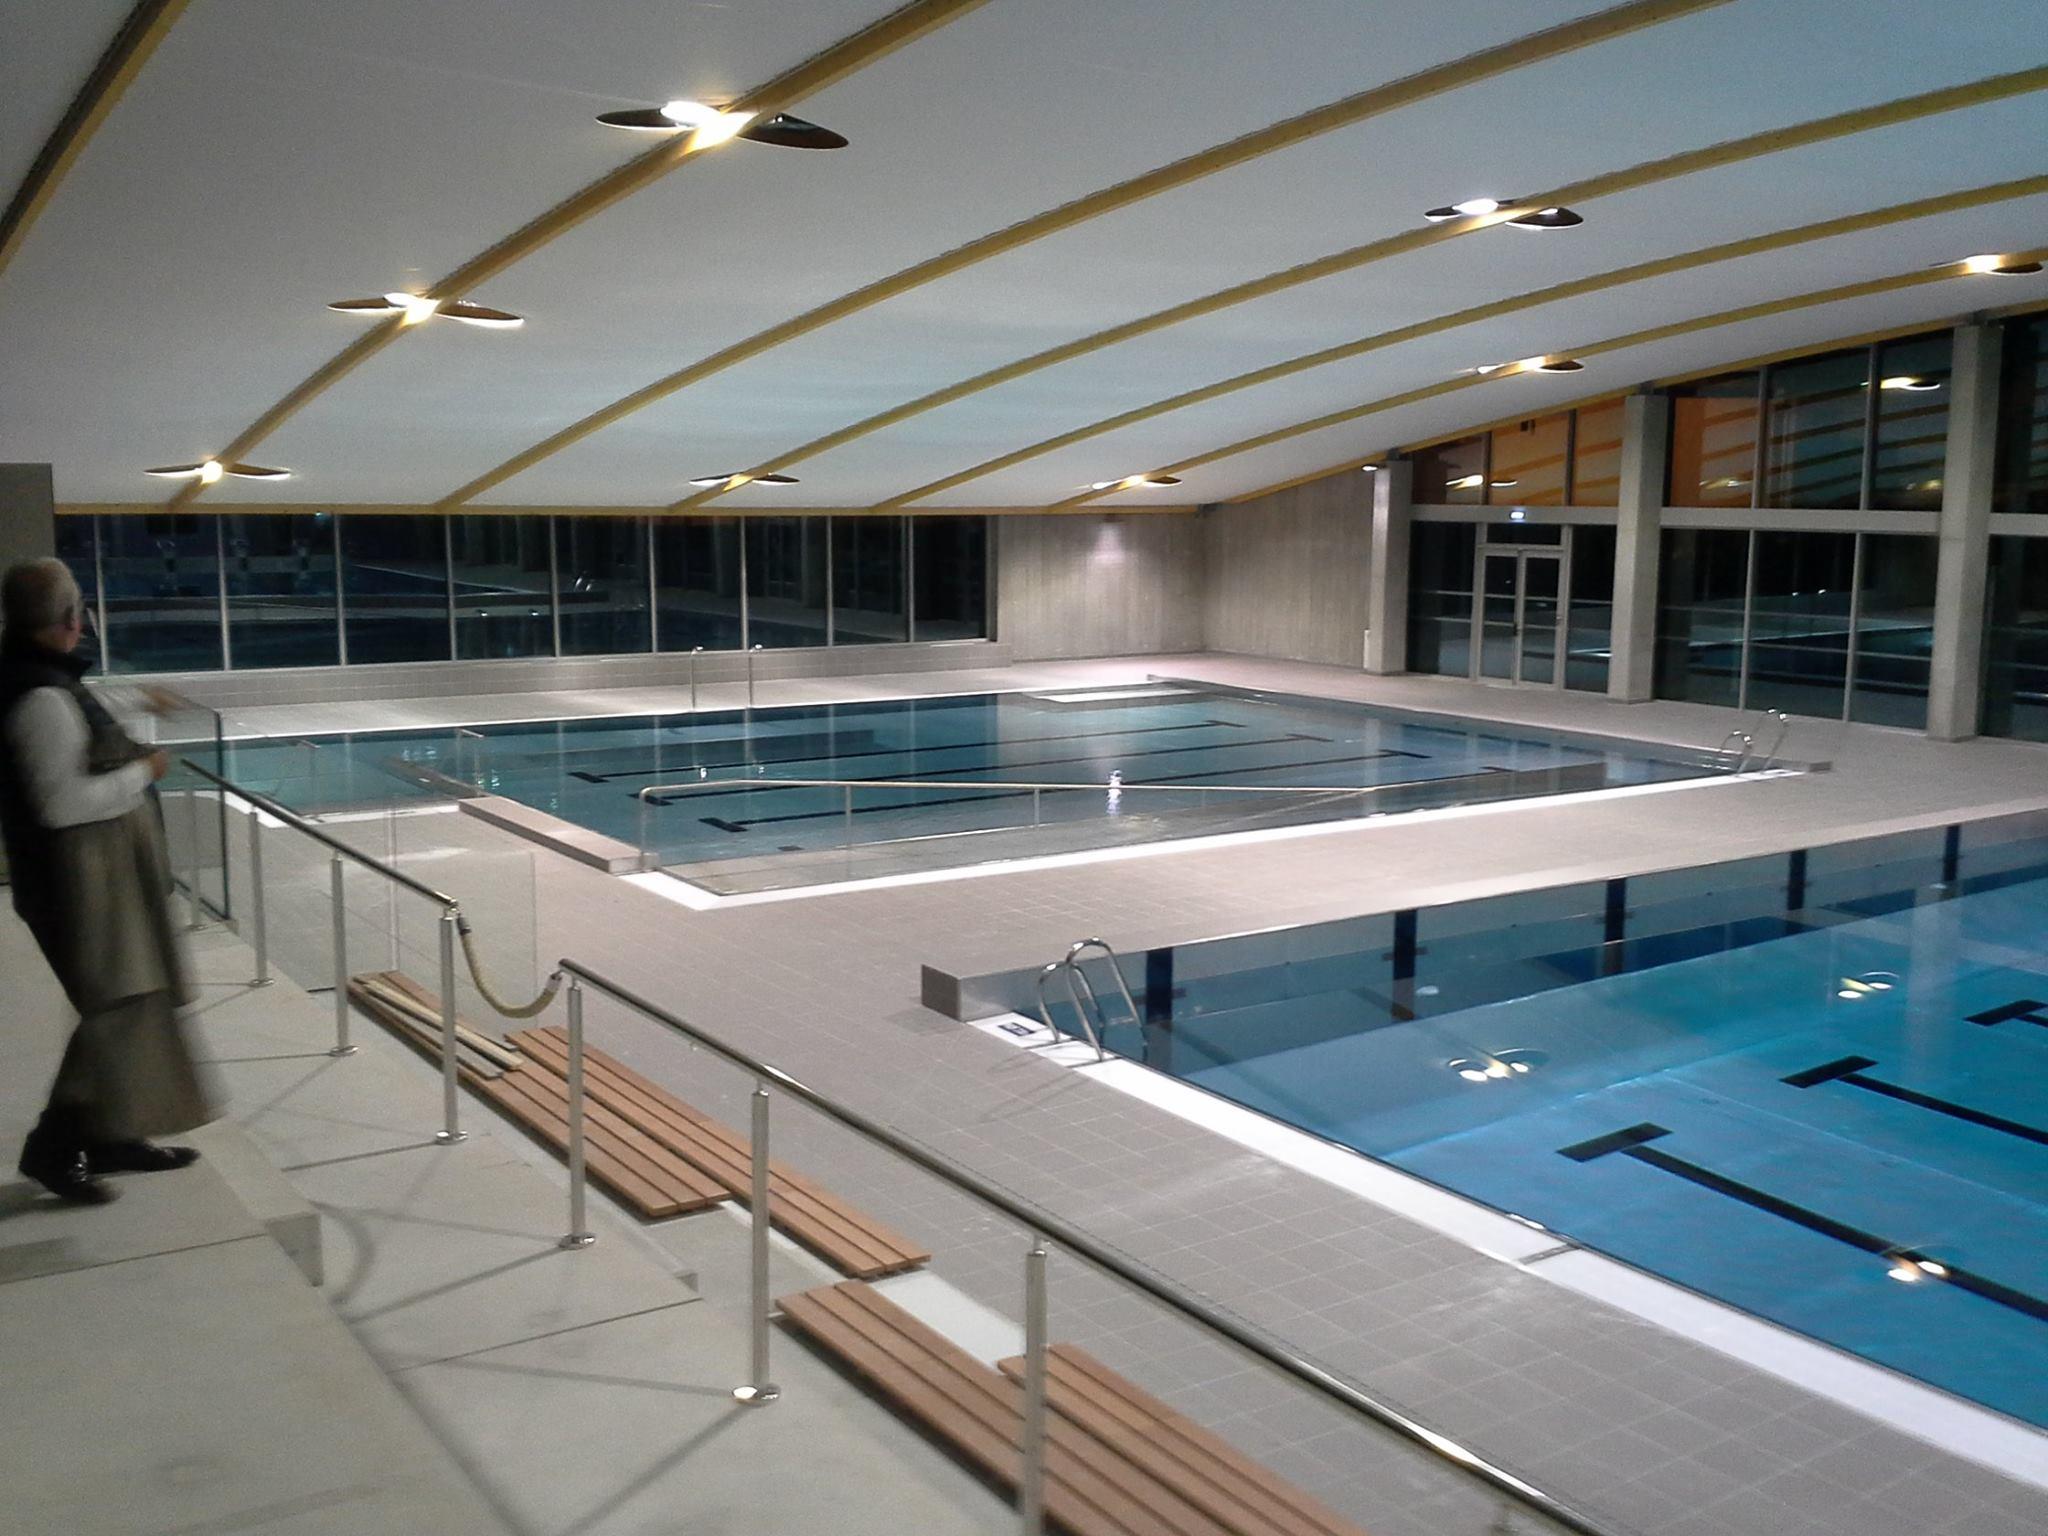 Nuova piscina comunale a lourdes 1 volontari di lourdes for Piscine lourdes